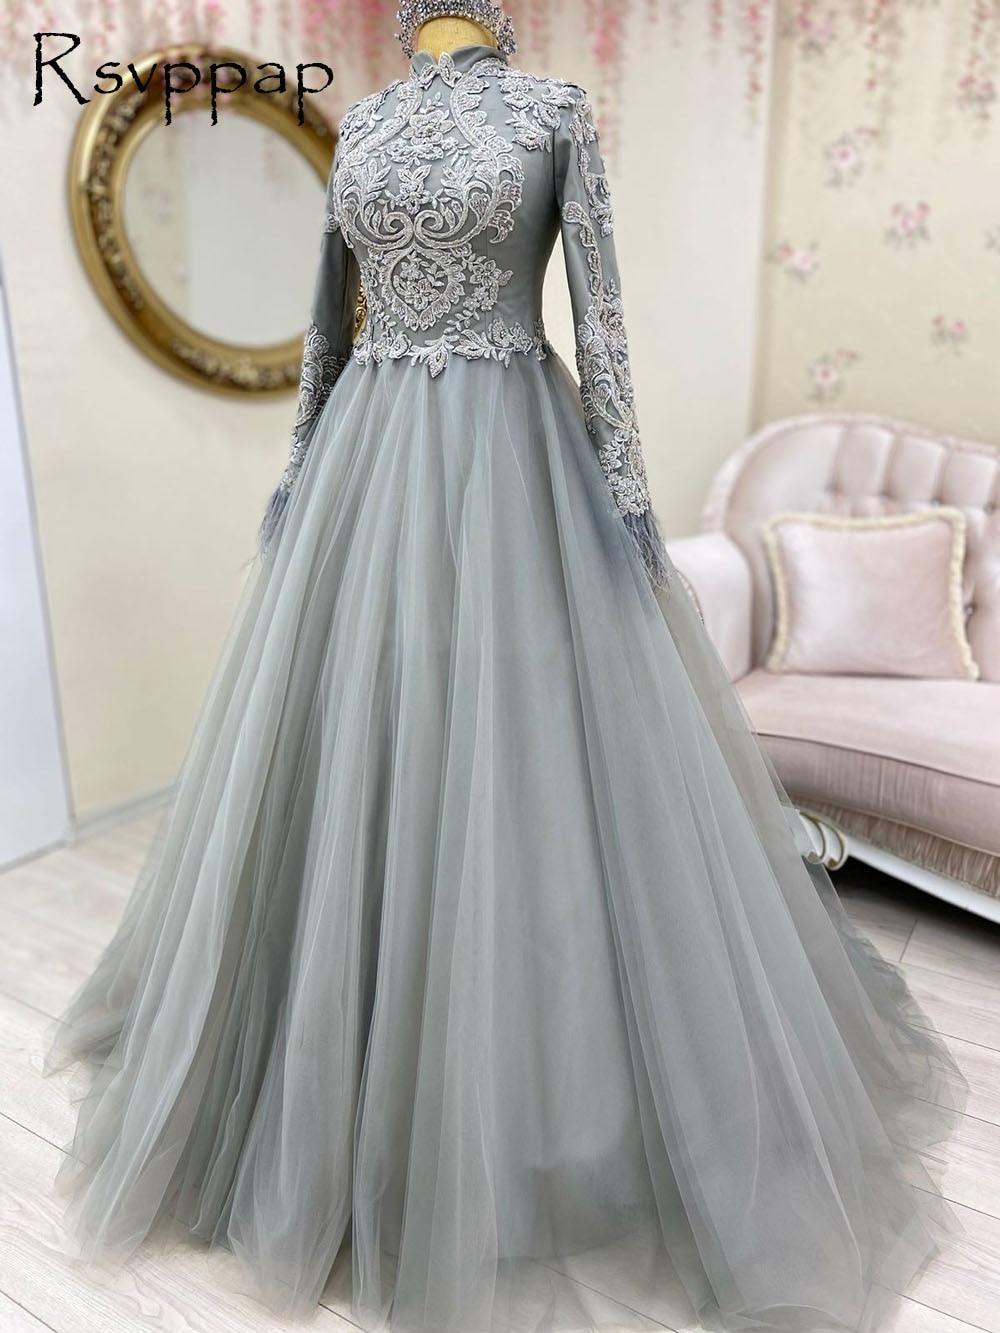 Elegant Long Evening Dress Dubai abaya 2021 High Neck Long Sleeve A-line Celebrity Muslim Silver Women Formal Gowns